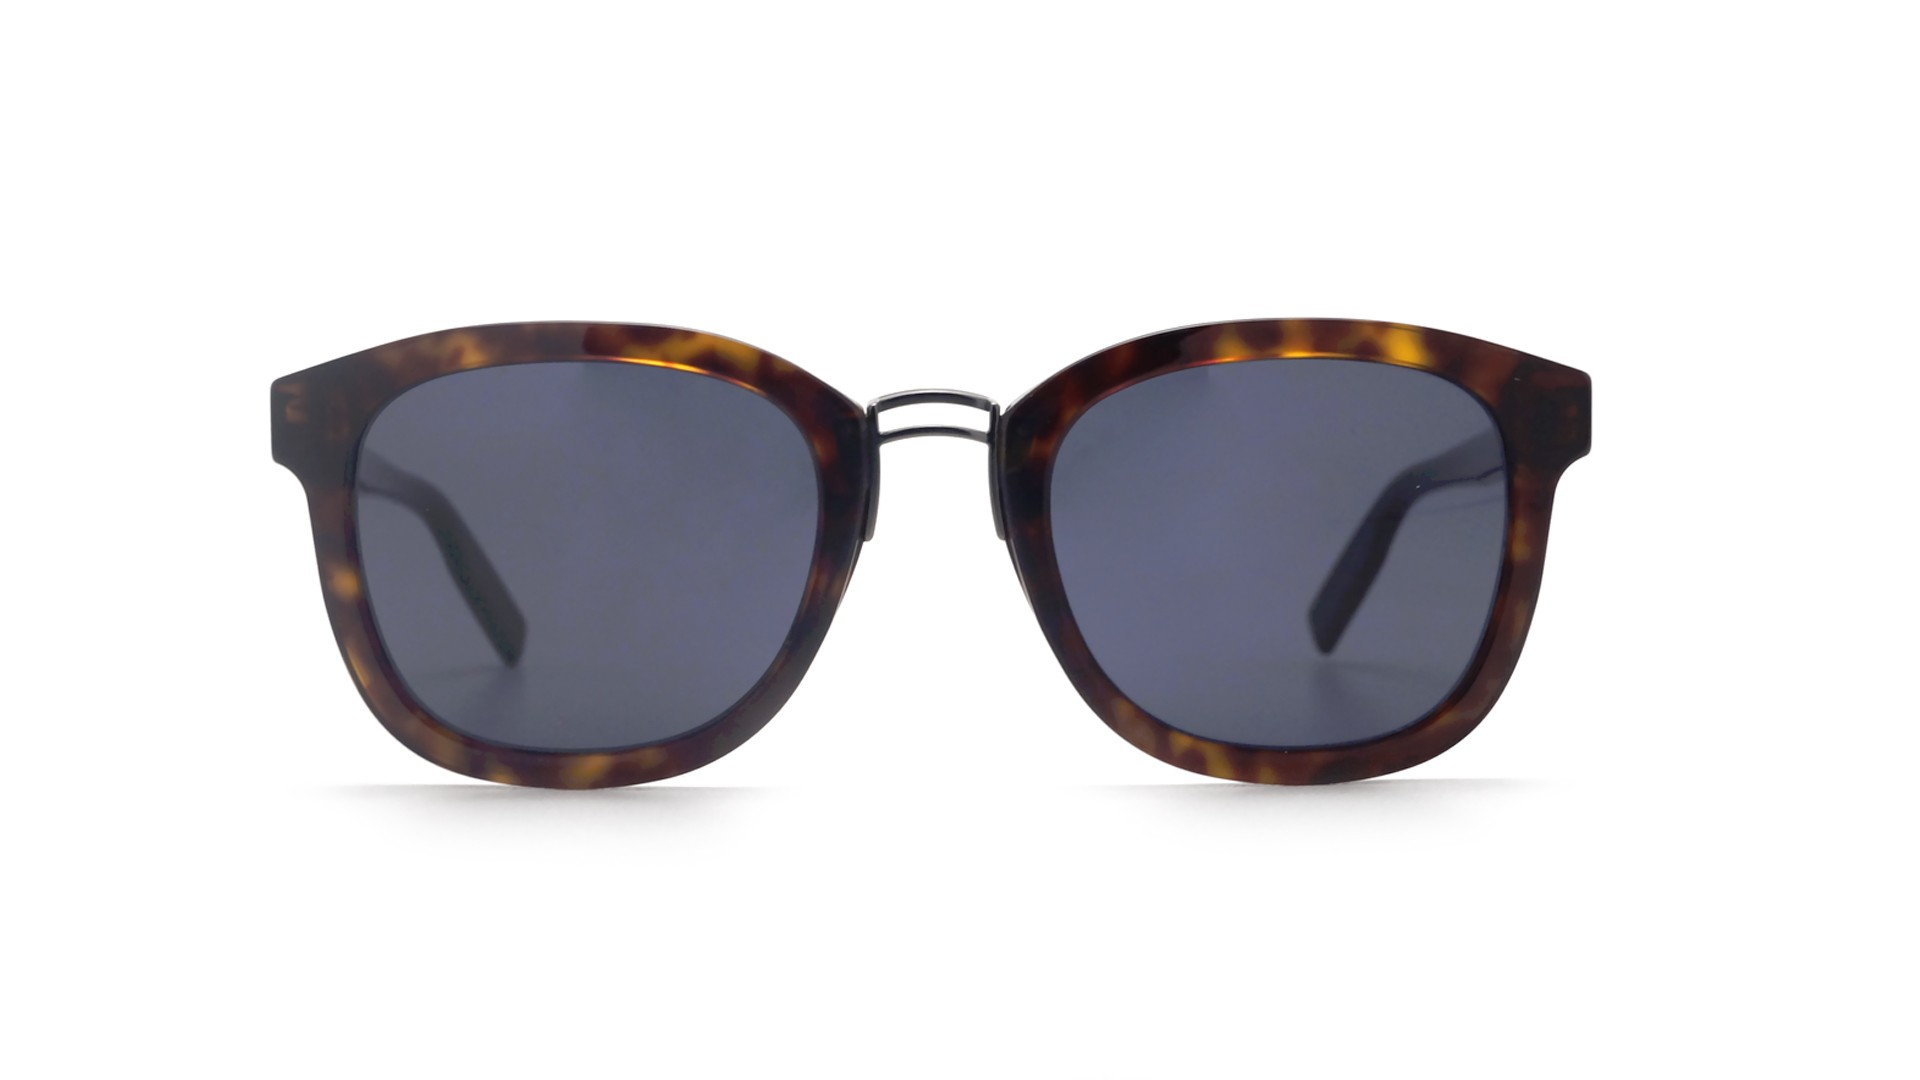 Dior Blacktie Écaille 0230S KVXKU 51-23   Prix 213,00 €   Visiofactory 7a811ba04ea